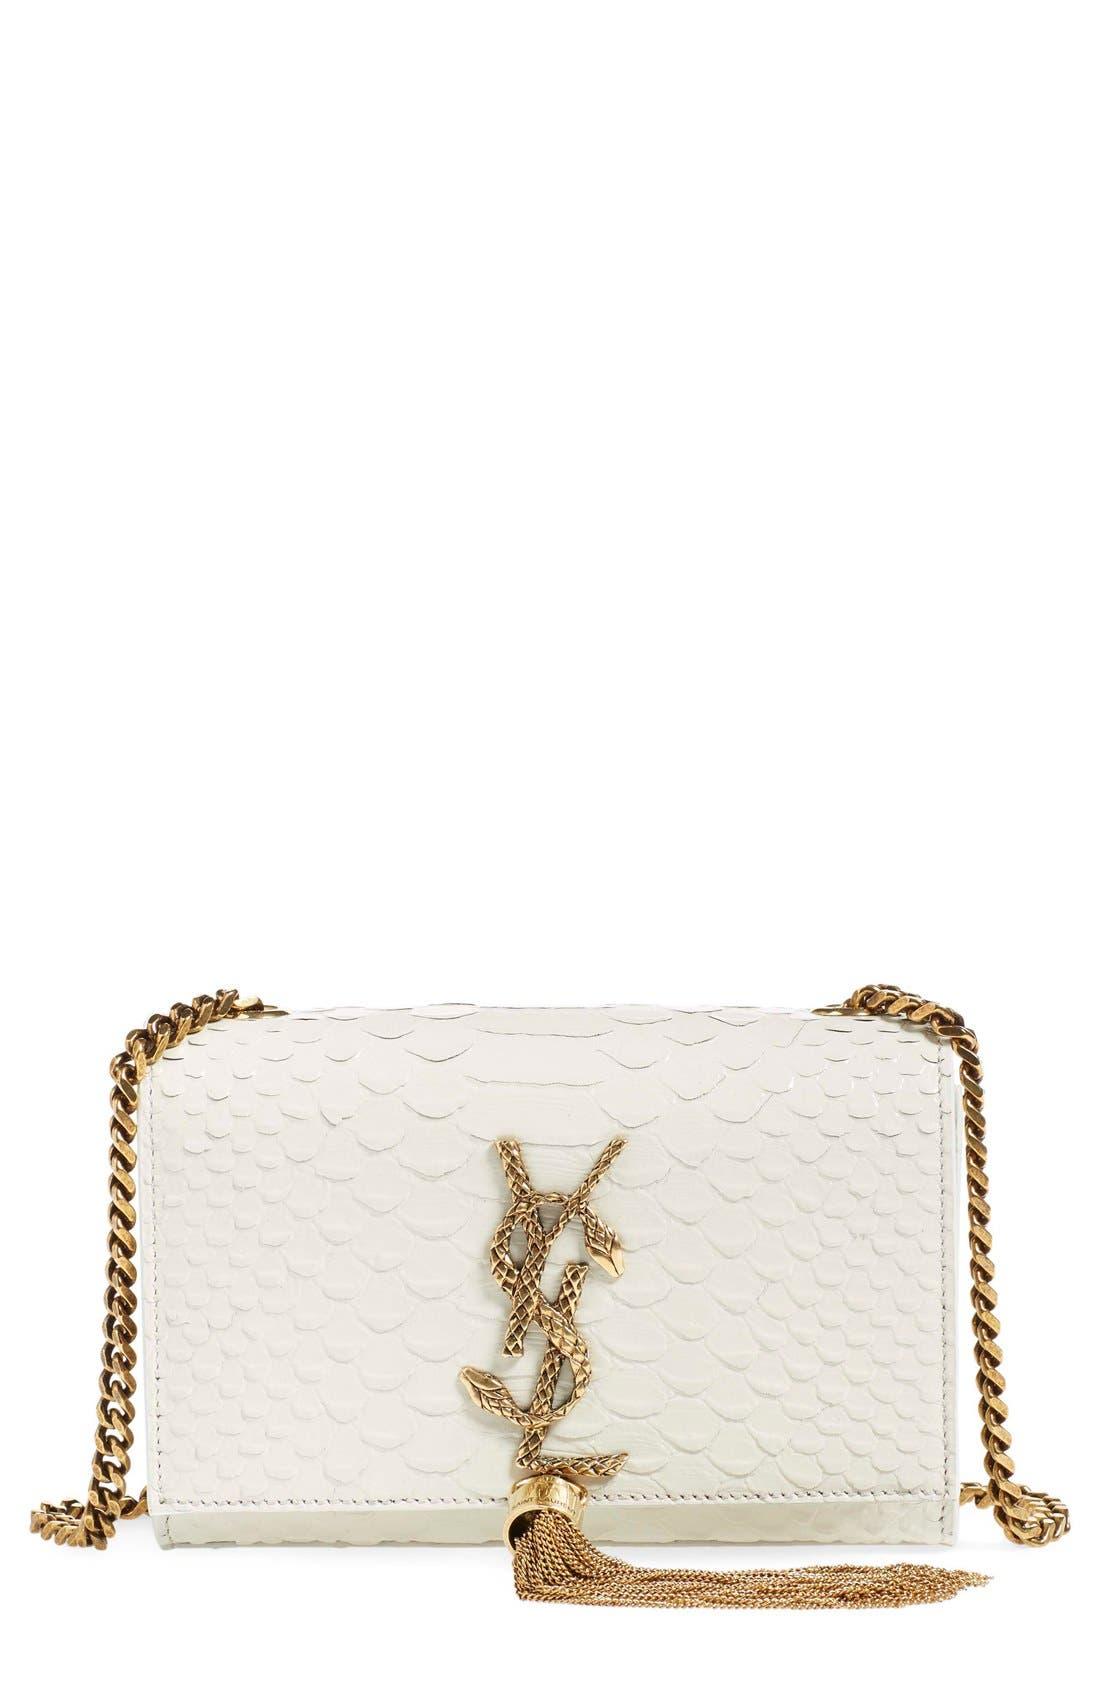 Alternate Image 1 Selected - Saint Laurent 'Mini Monogram - Serpent' Tassel Crossbody Bag